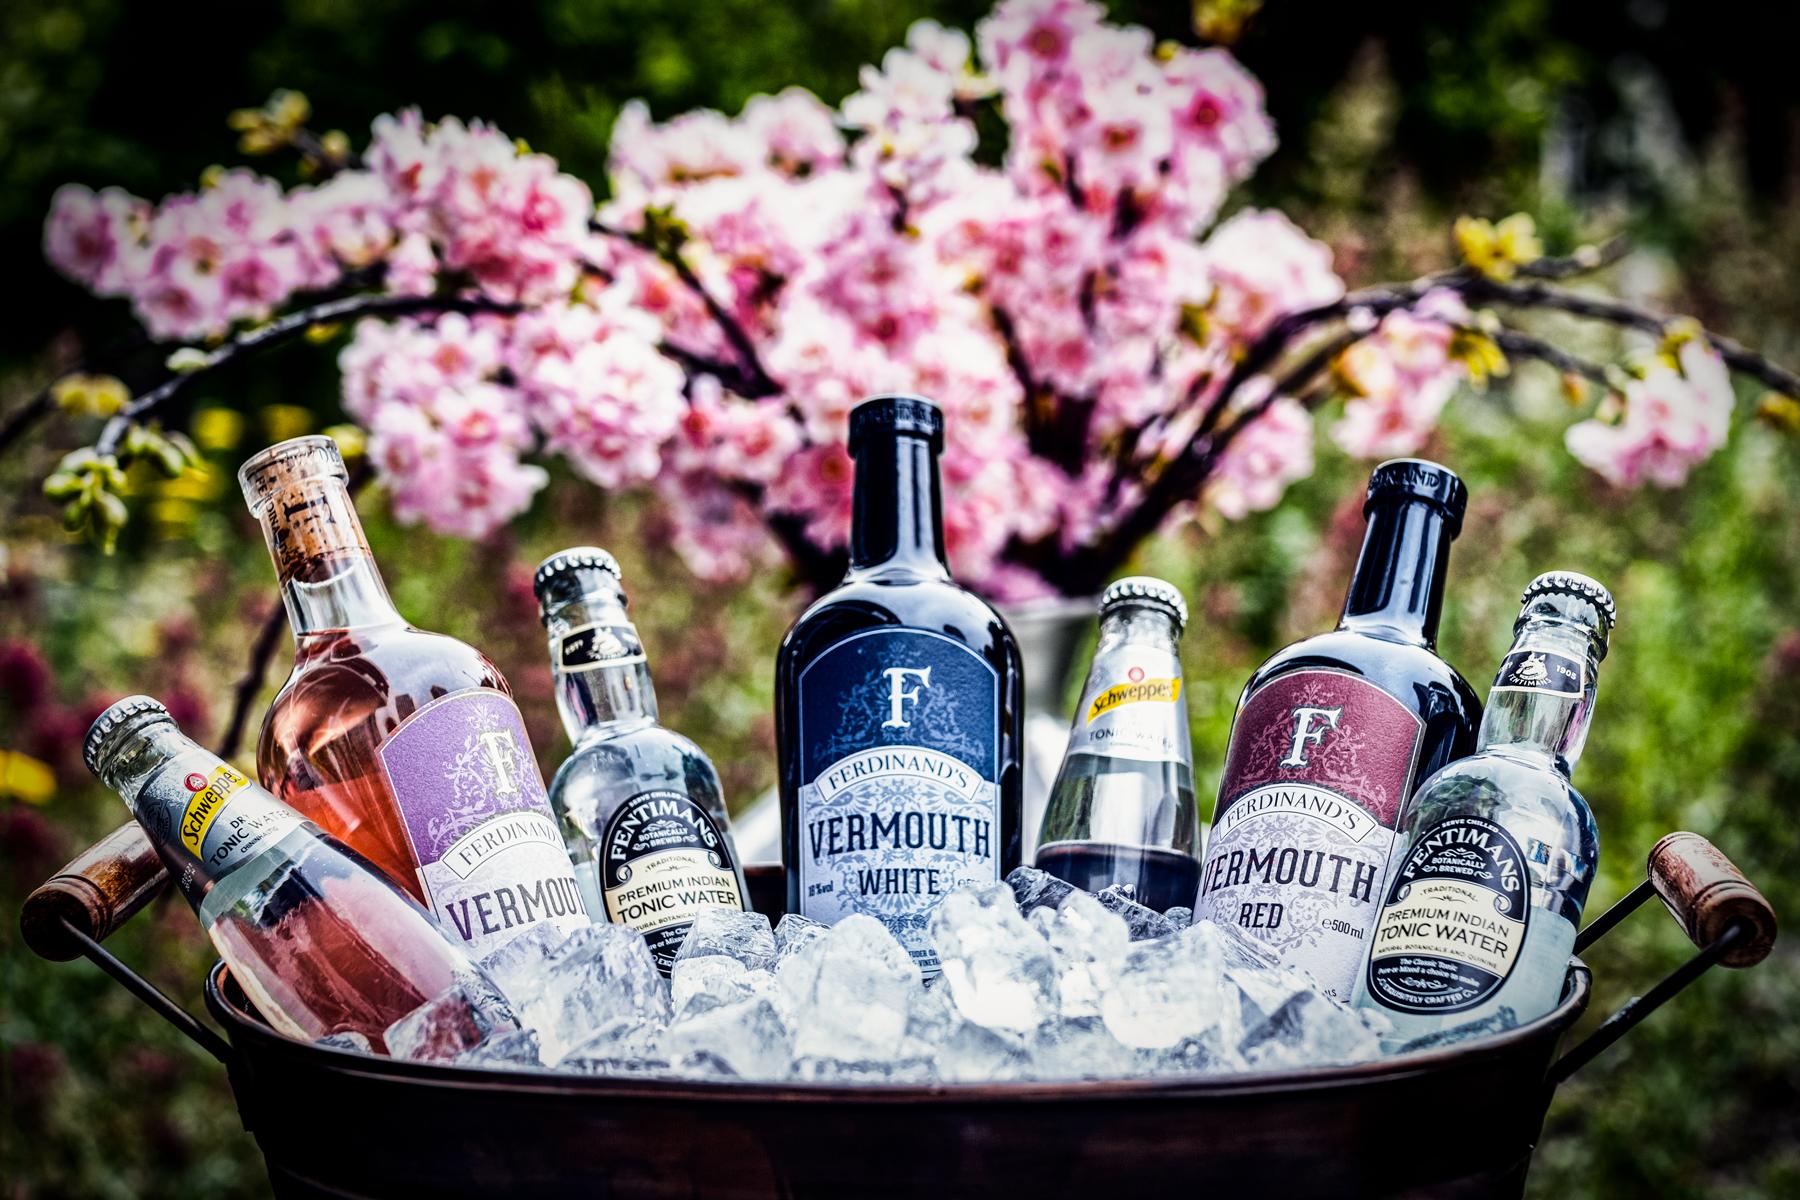 sommer vermouth wermut copper bar restaurant room frankfurt alte oper events food drinks lounge